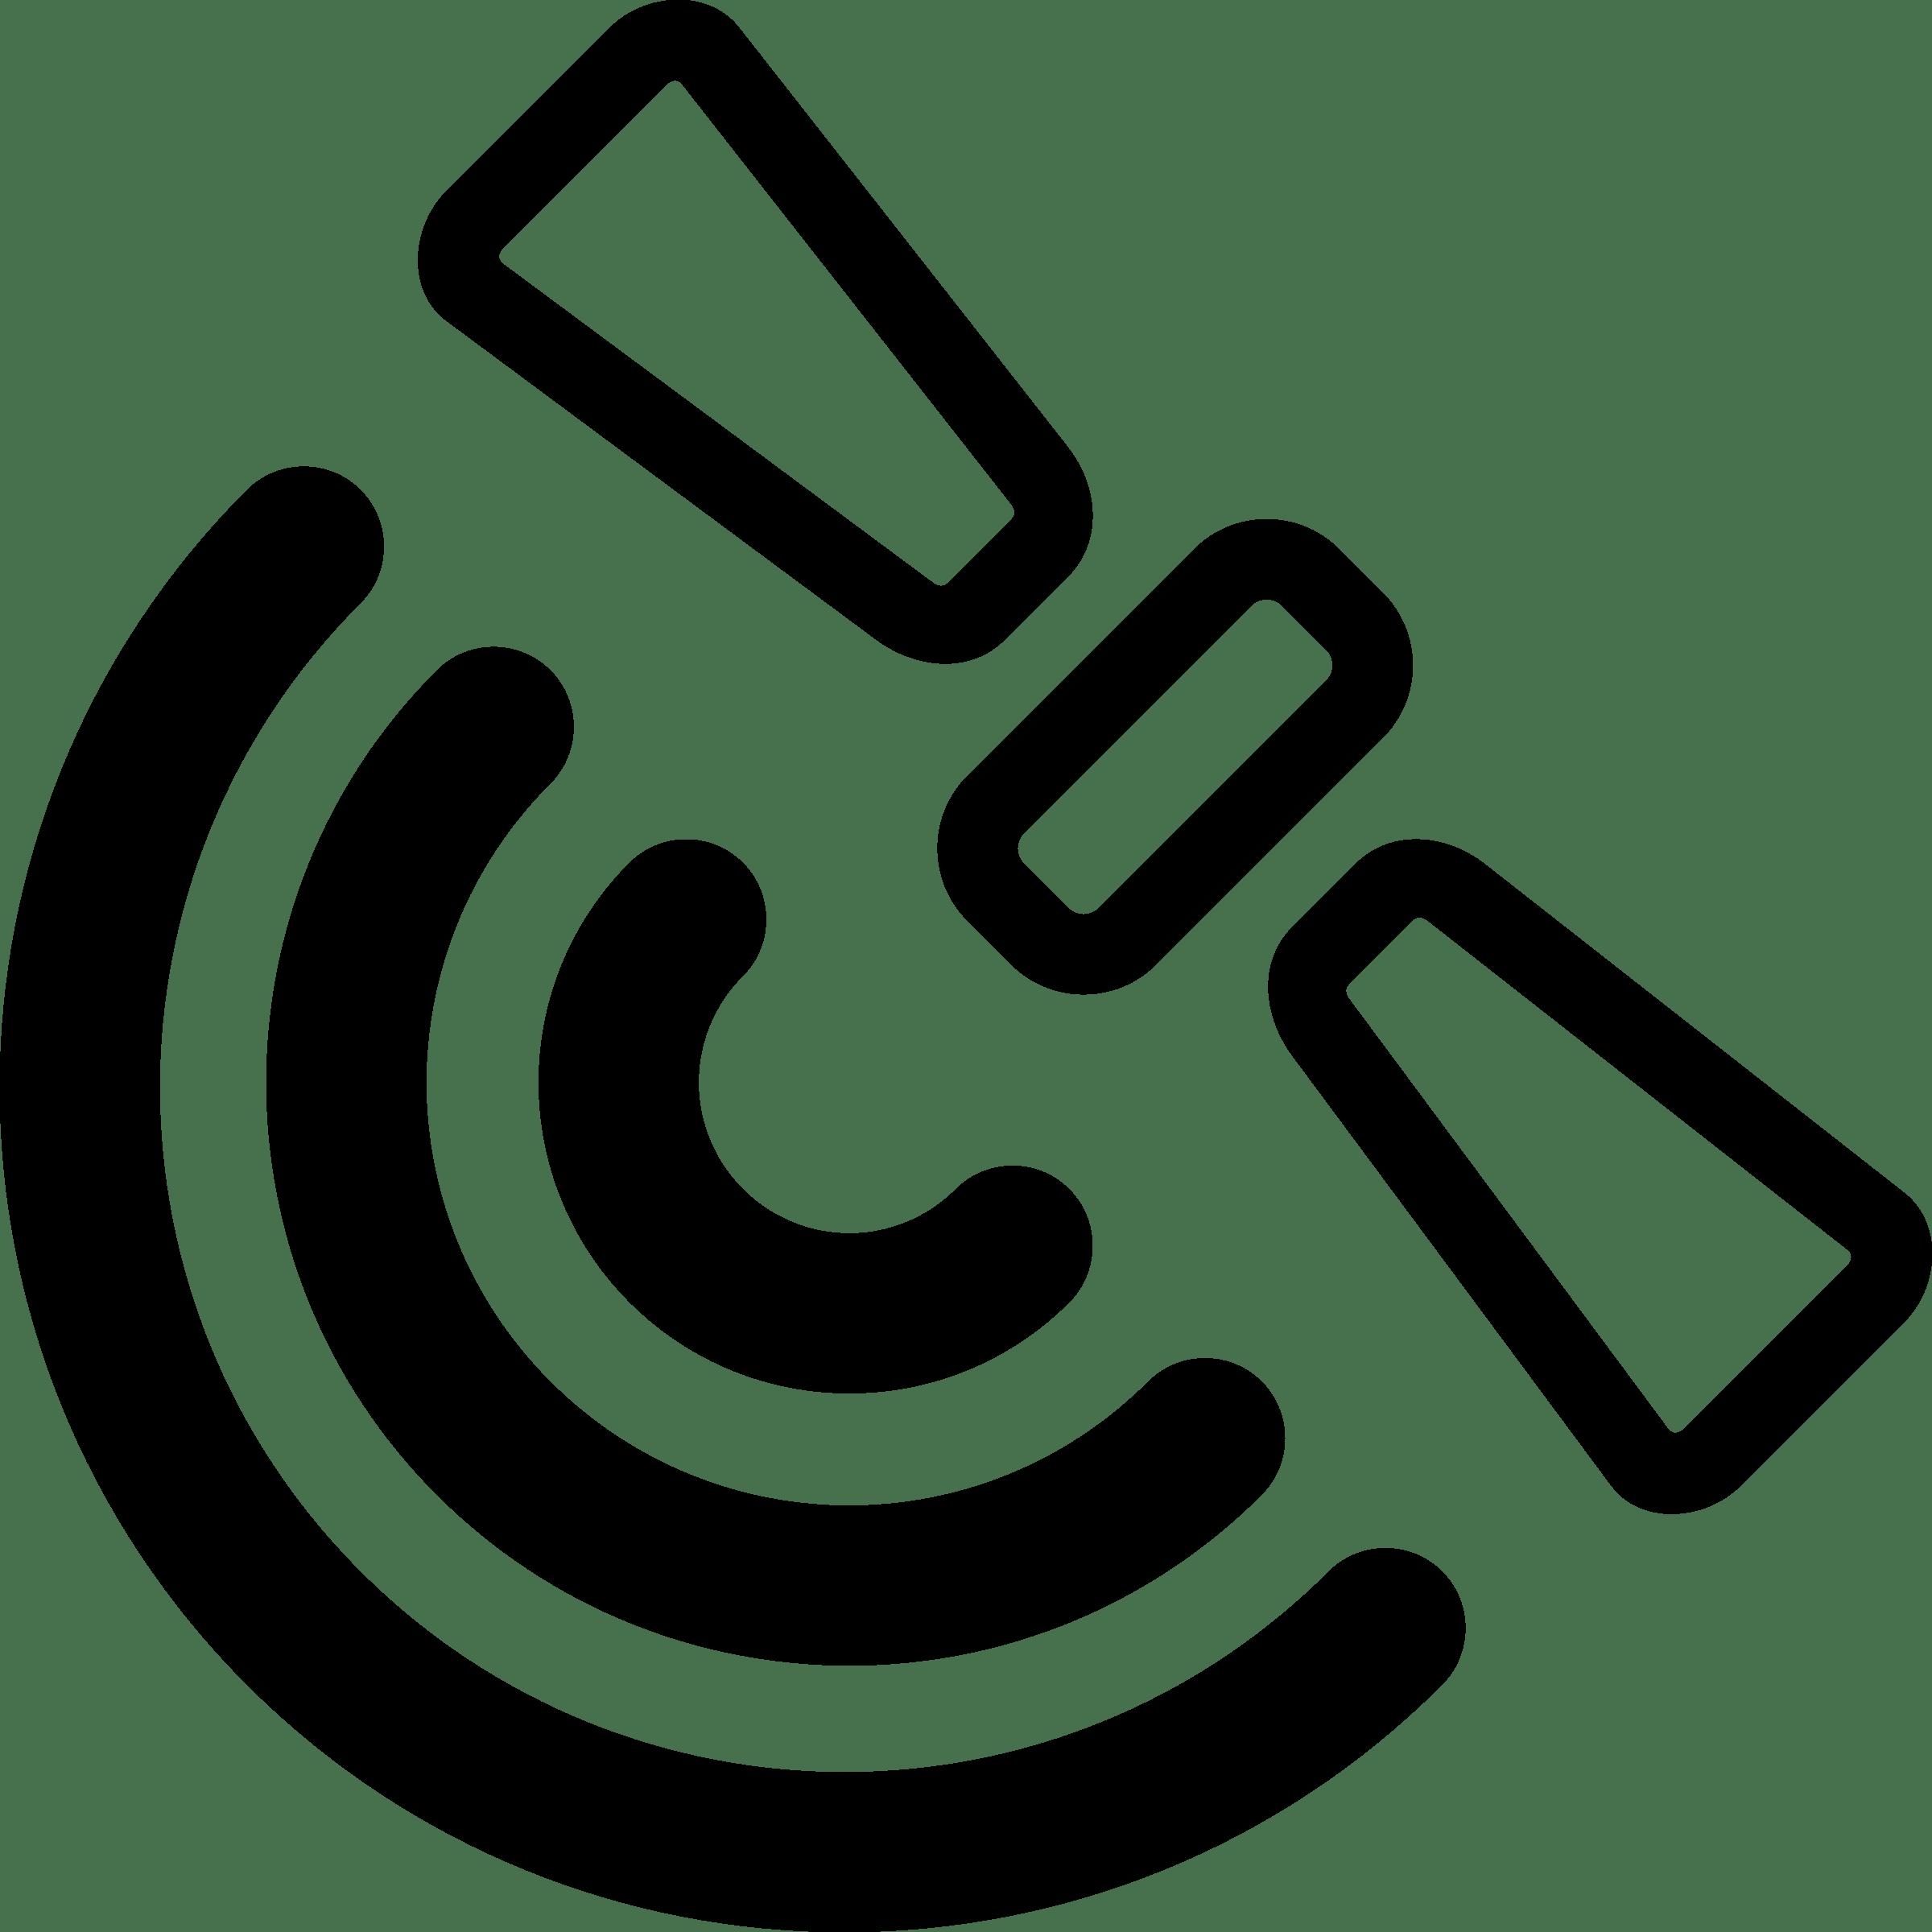 Transparent png images stickpng. Gps clipart satellite signal